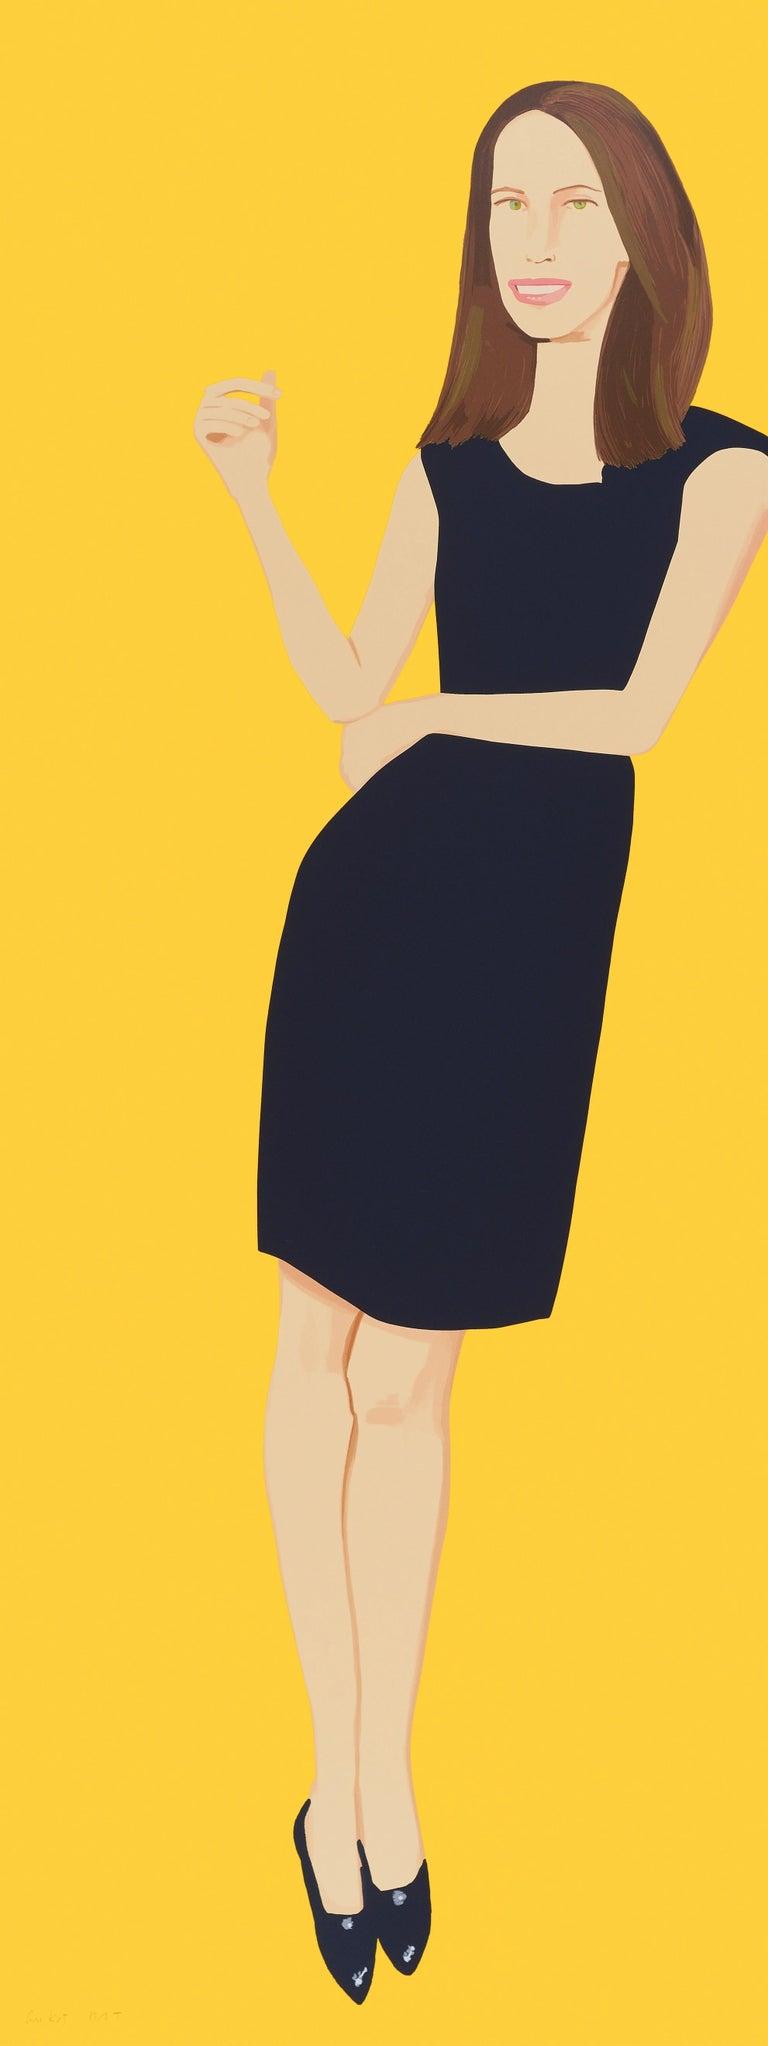 Alex Katz Portrait Print - Black Dress - Christy